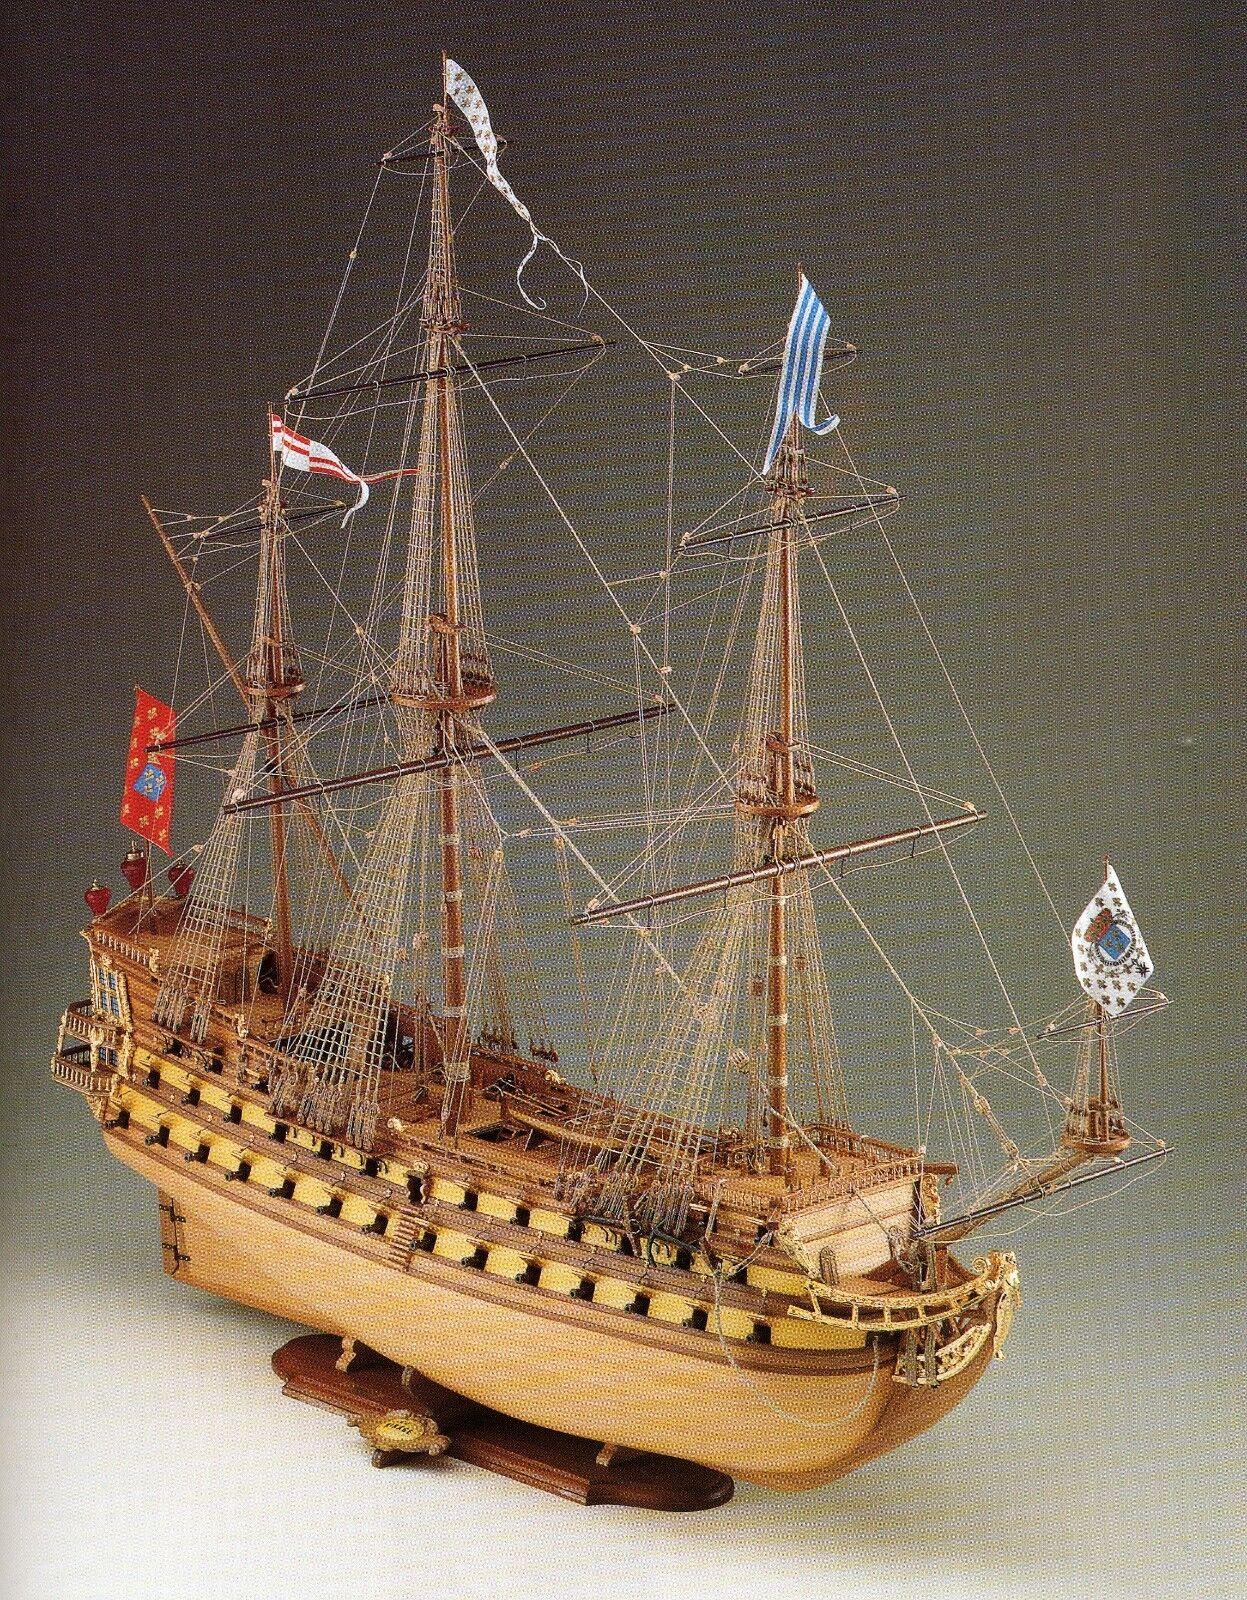 COREL SM10 BARCA modellllerlerlo MIRAGE imbrocezione Nava armata VASCELLO francese 1 75